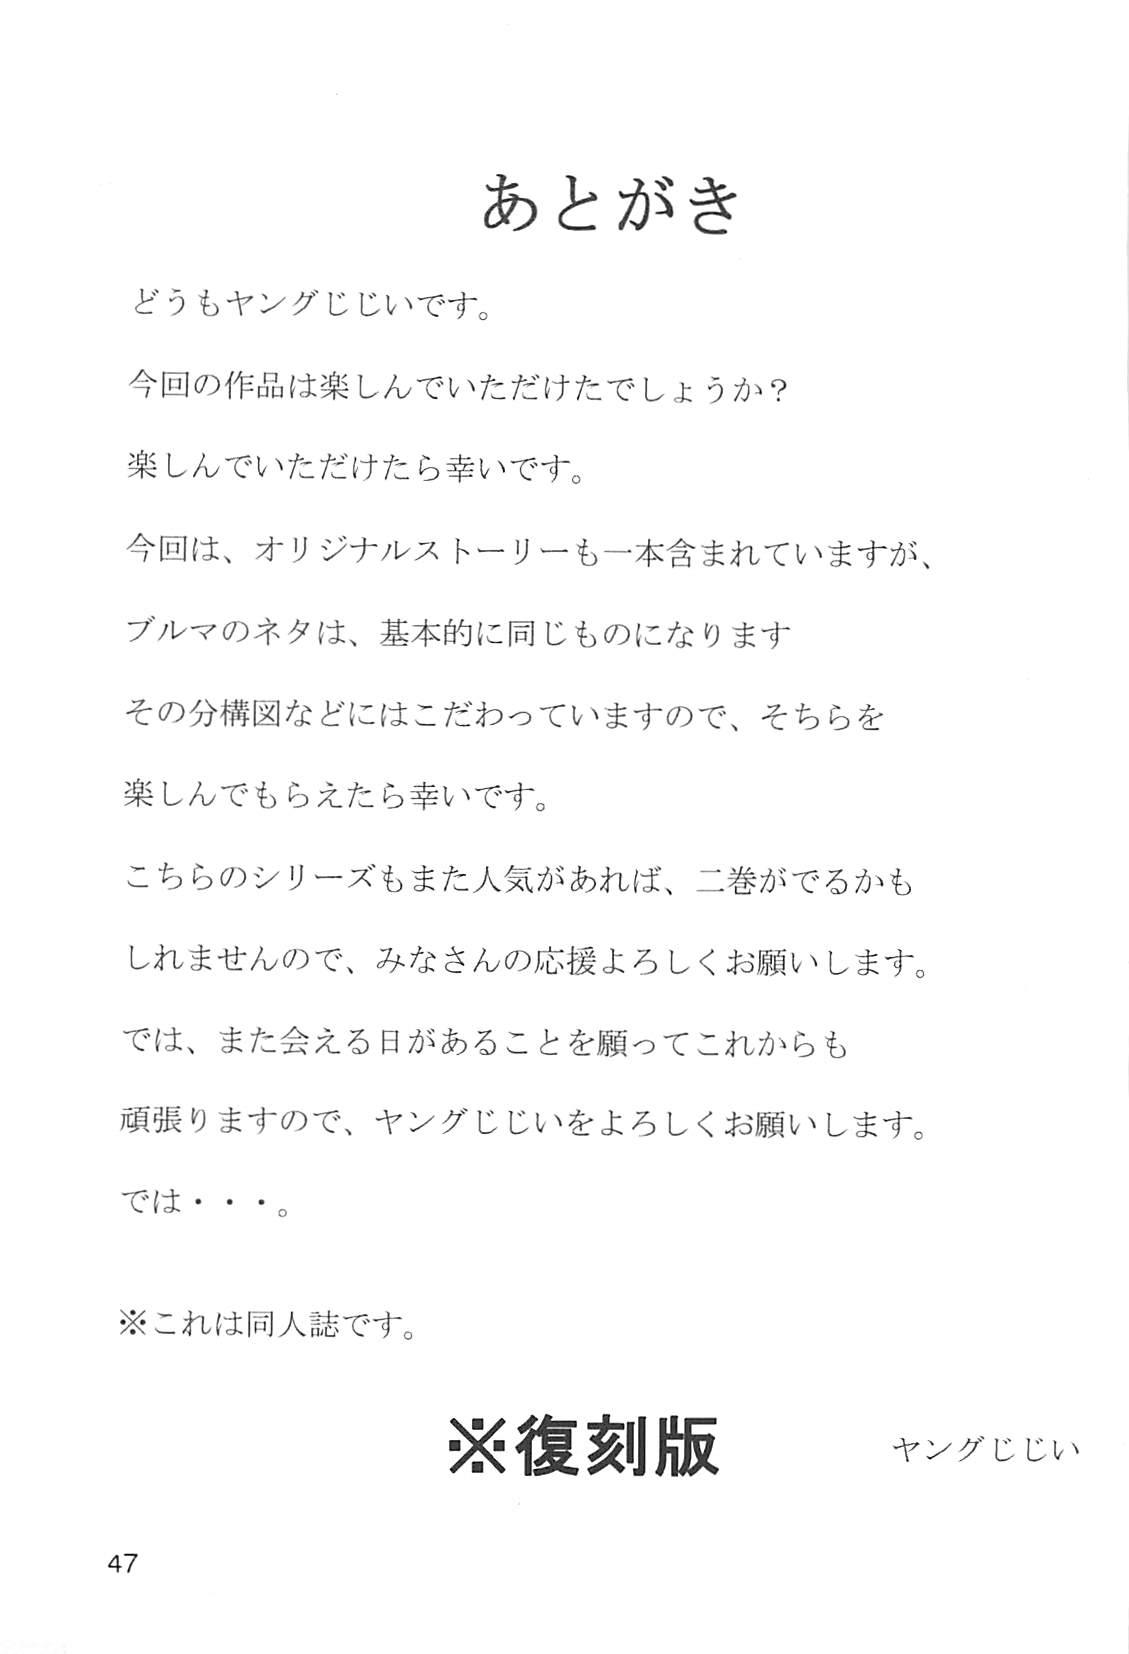 Dragon Ball Girls Collection 1 Fukkokuban 45